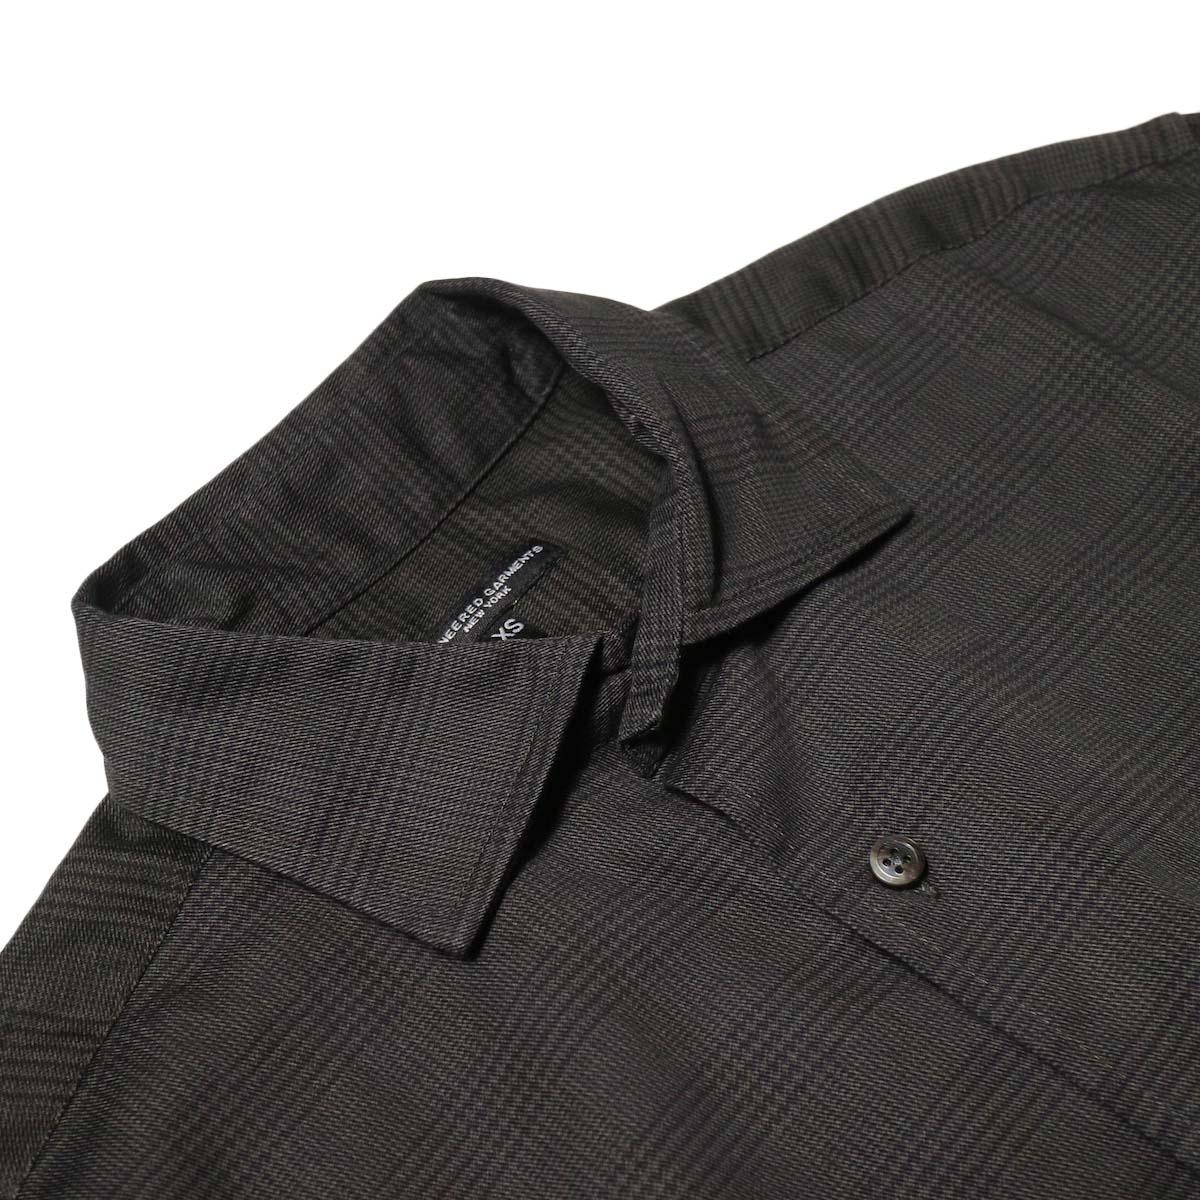 Engineered Garments / Spread Collar Shirt -Glen Plaid (Grey)ヘンリーネック